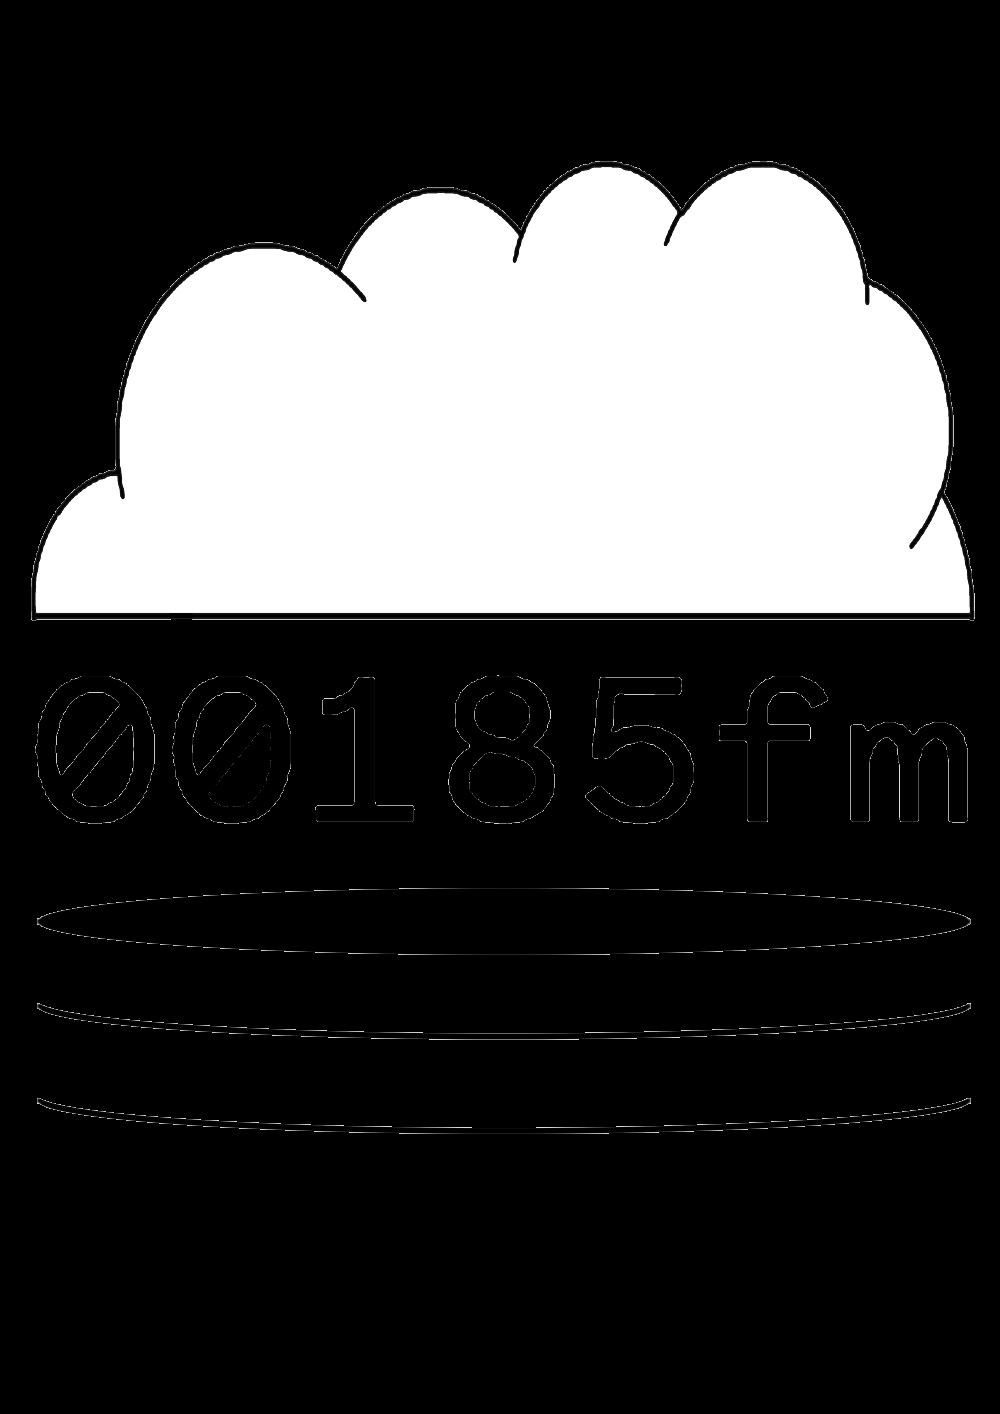 00185fm